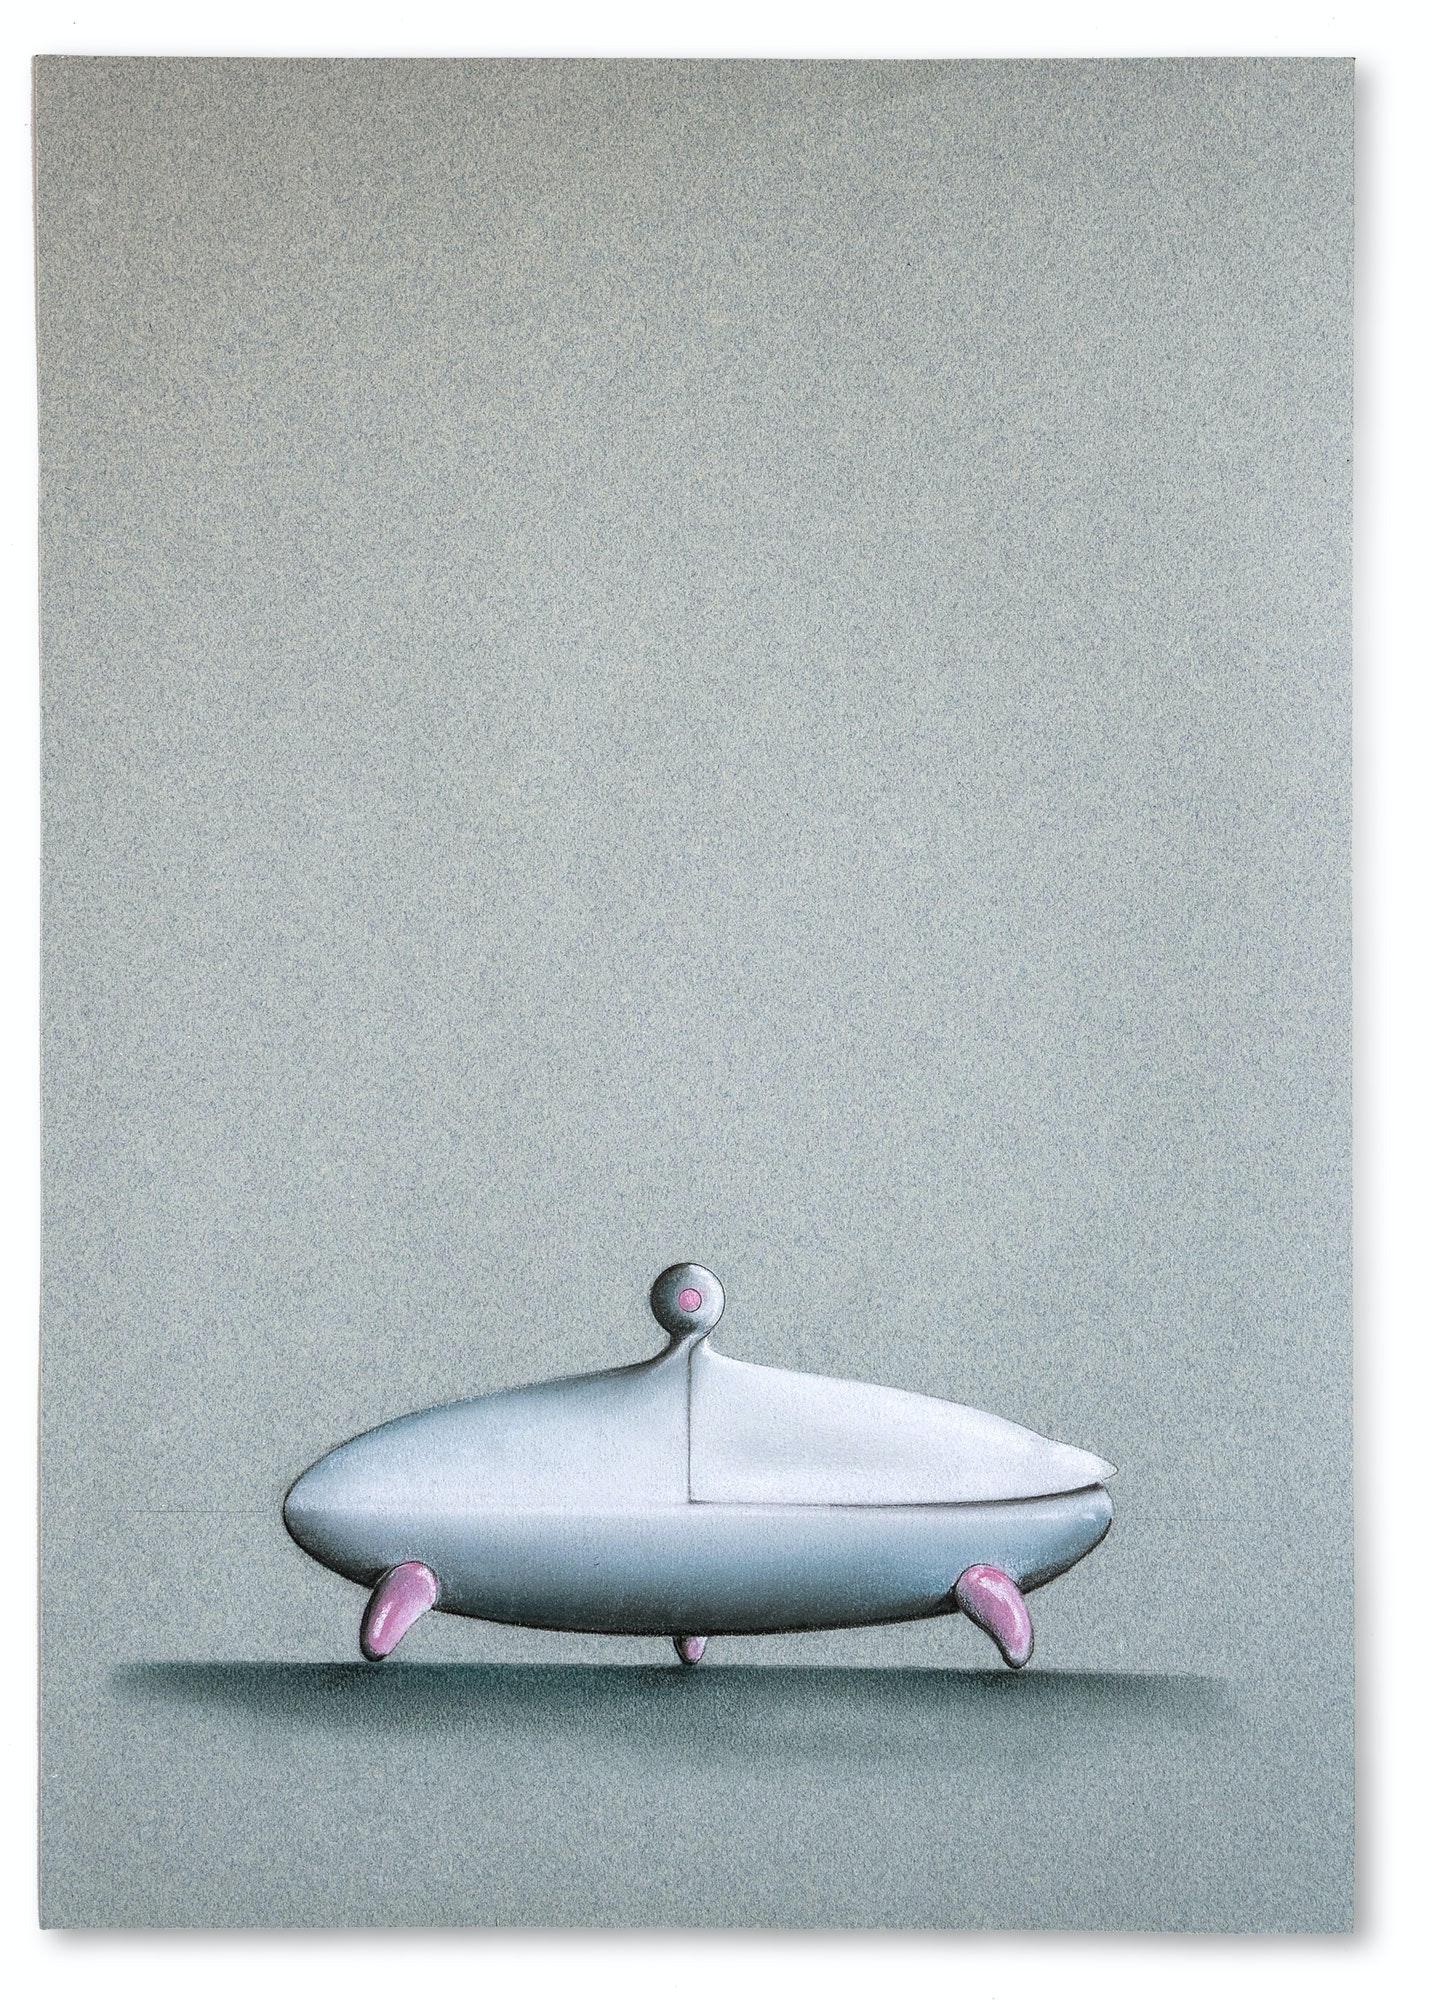 Michael Loos - Ceramic-Sugar_DSC8959